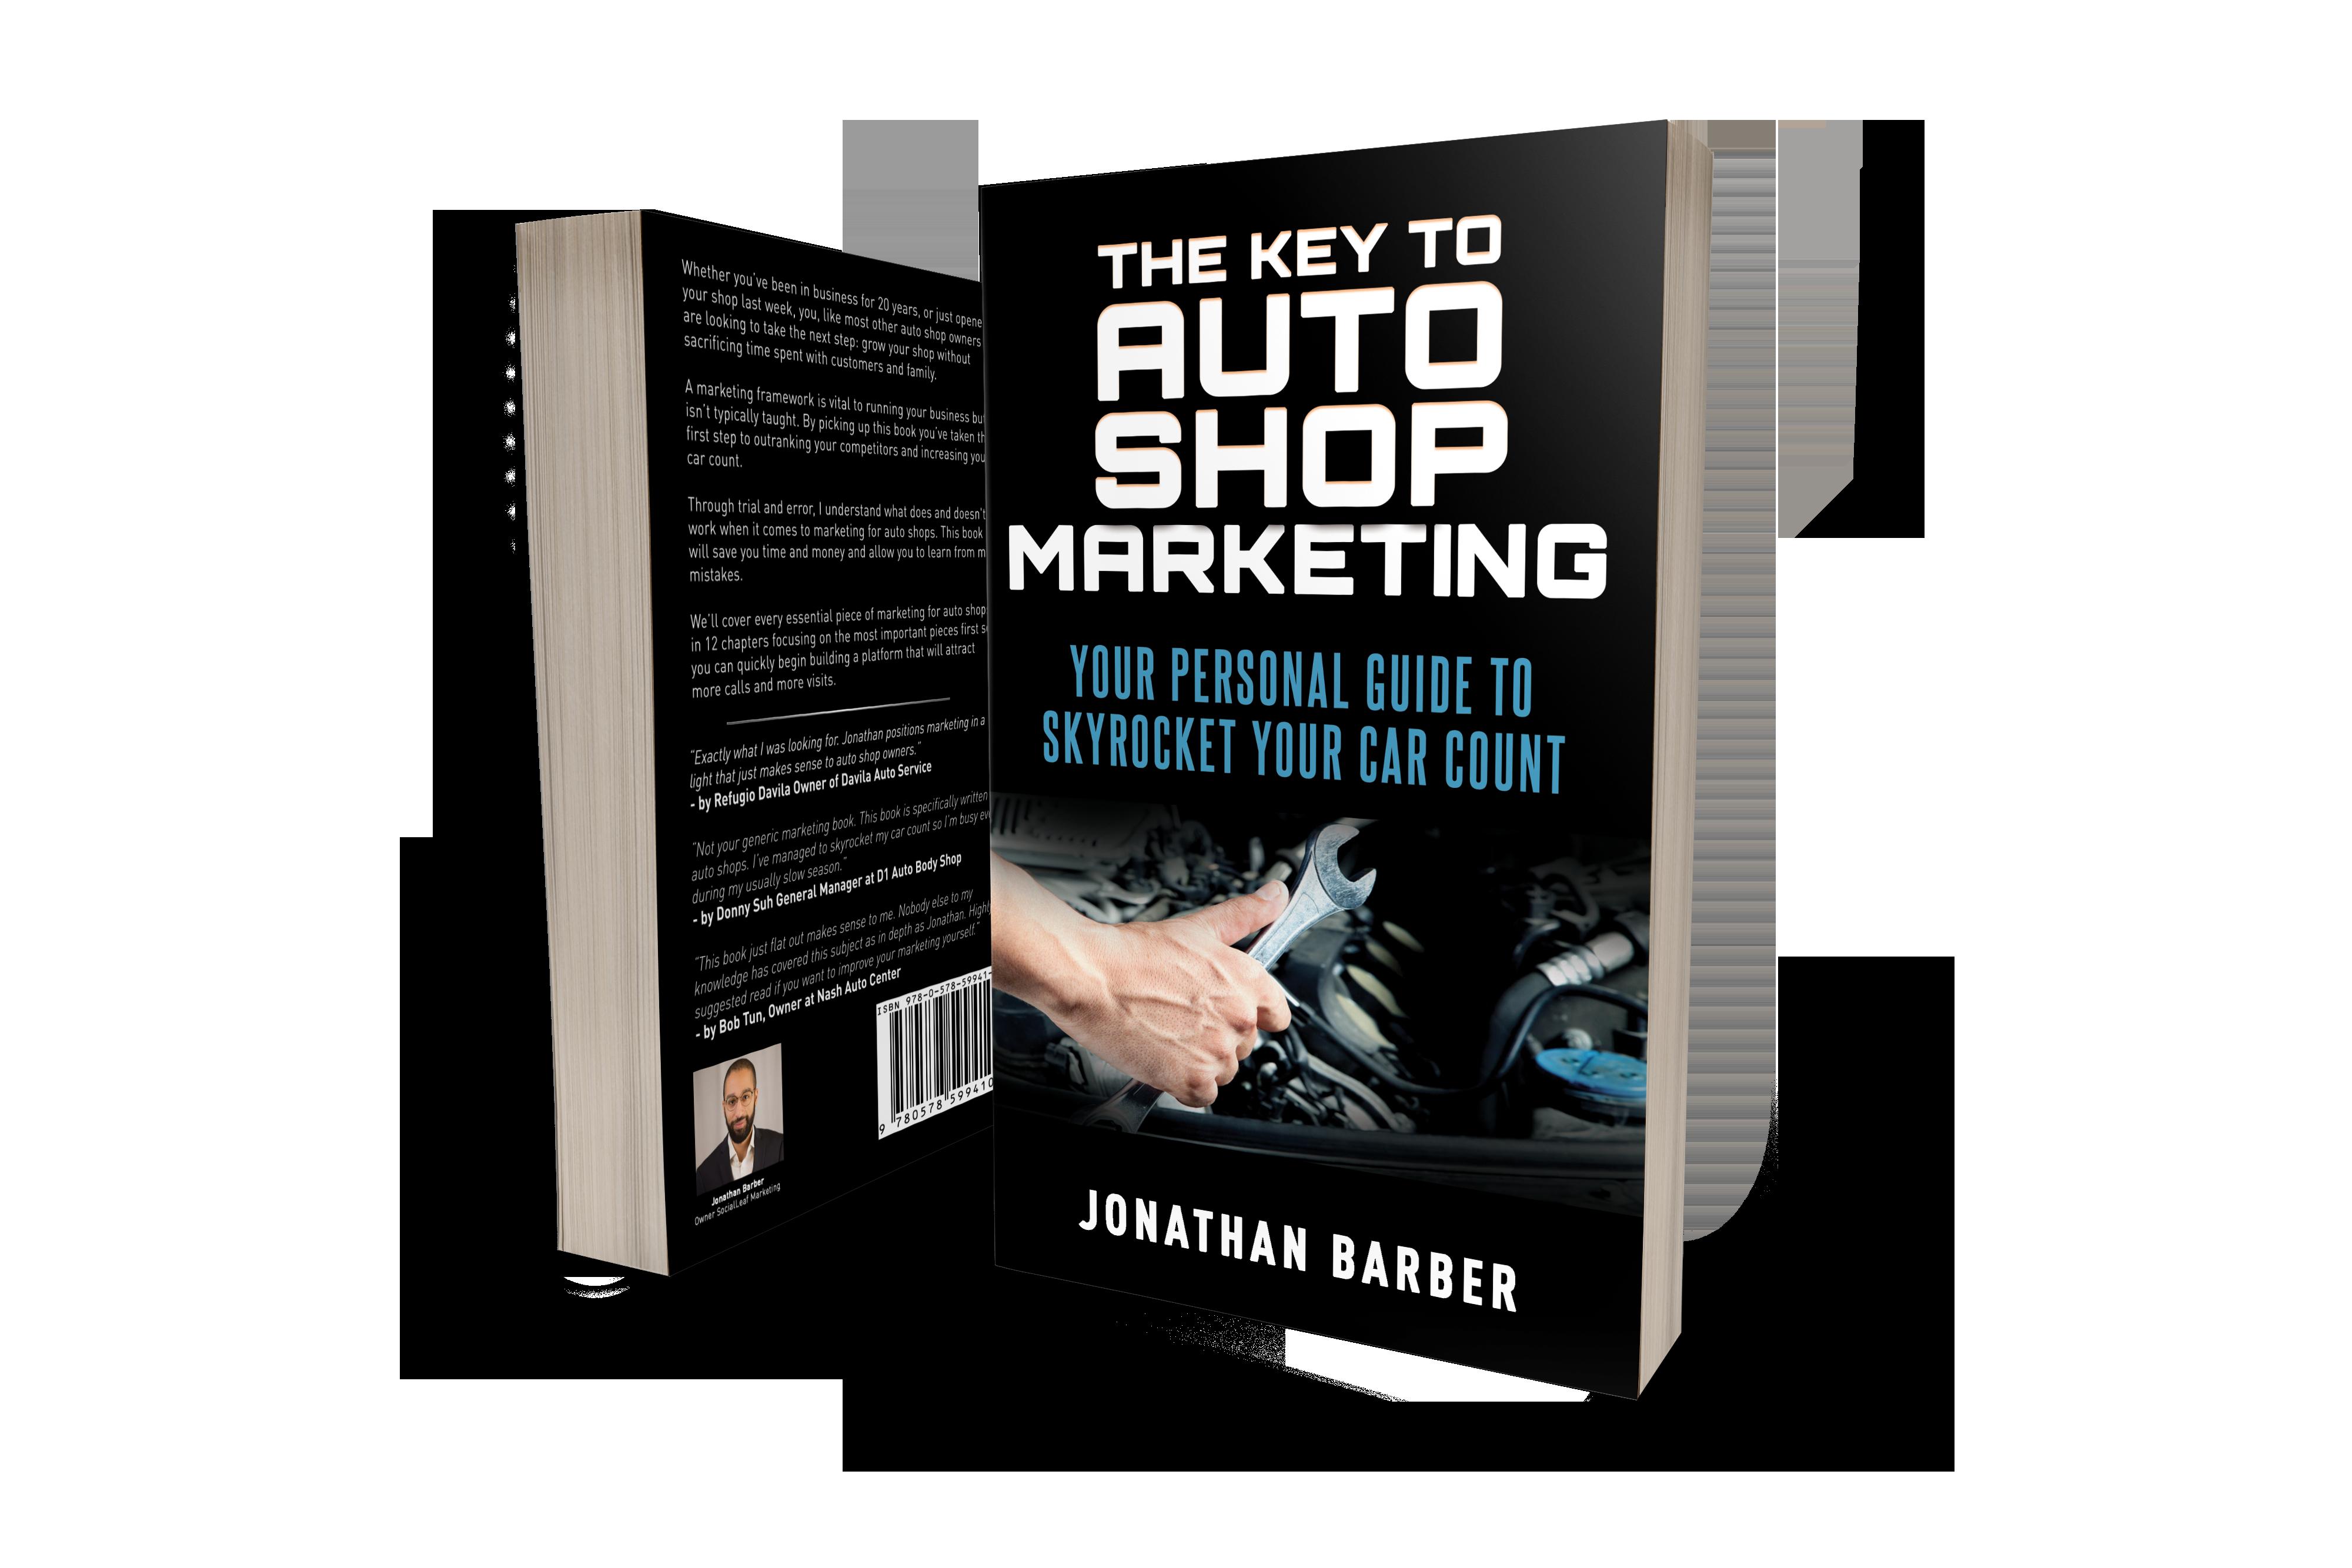 Auto shop marketing